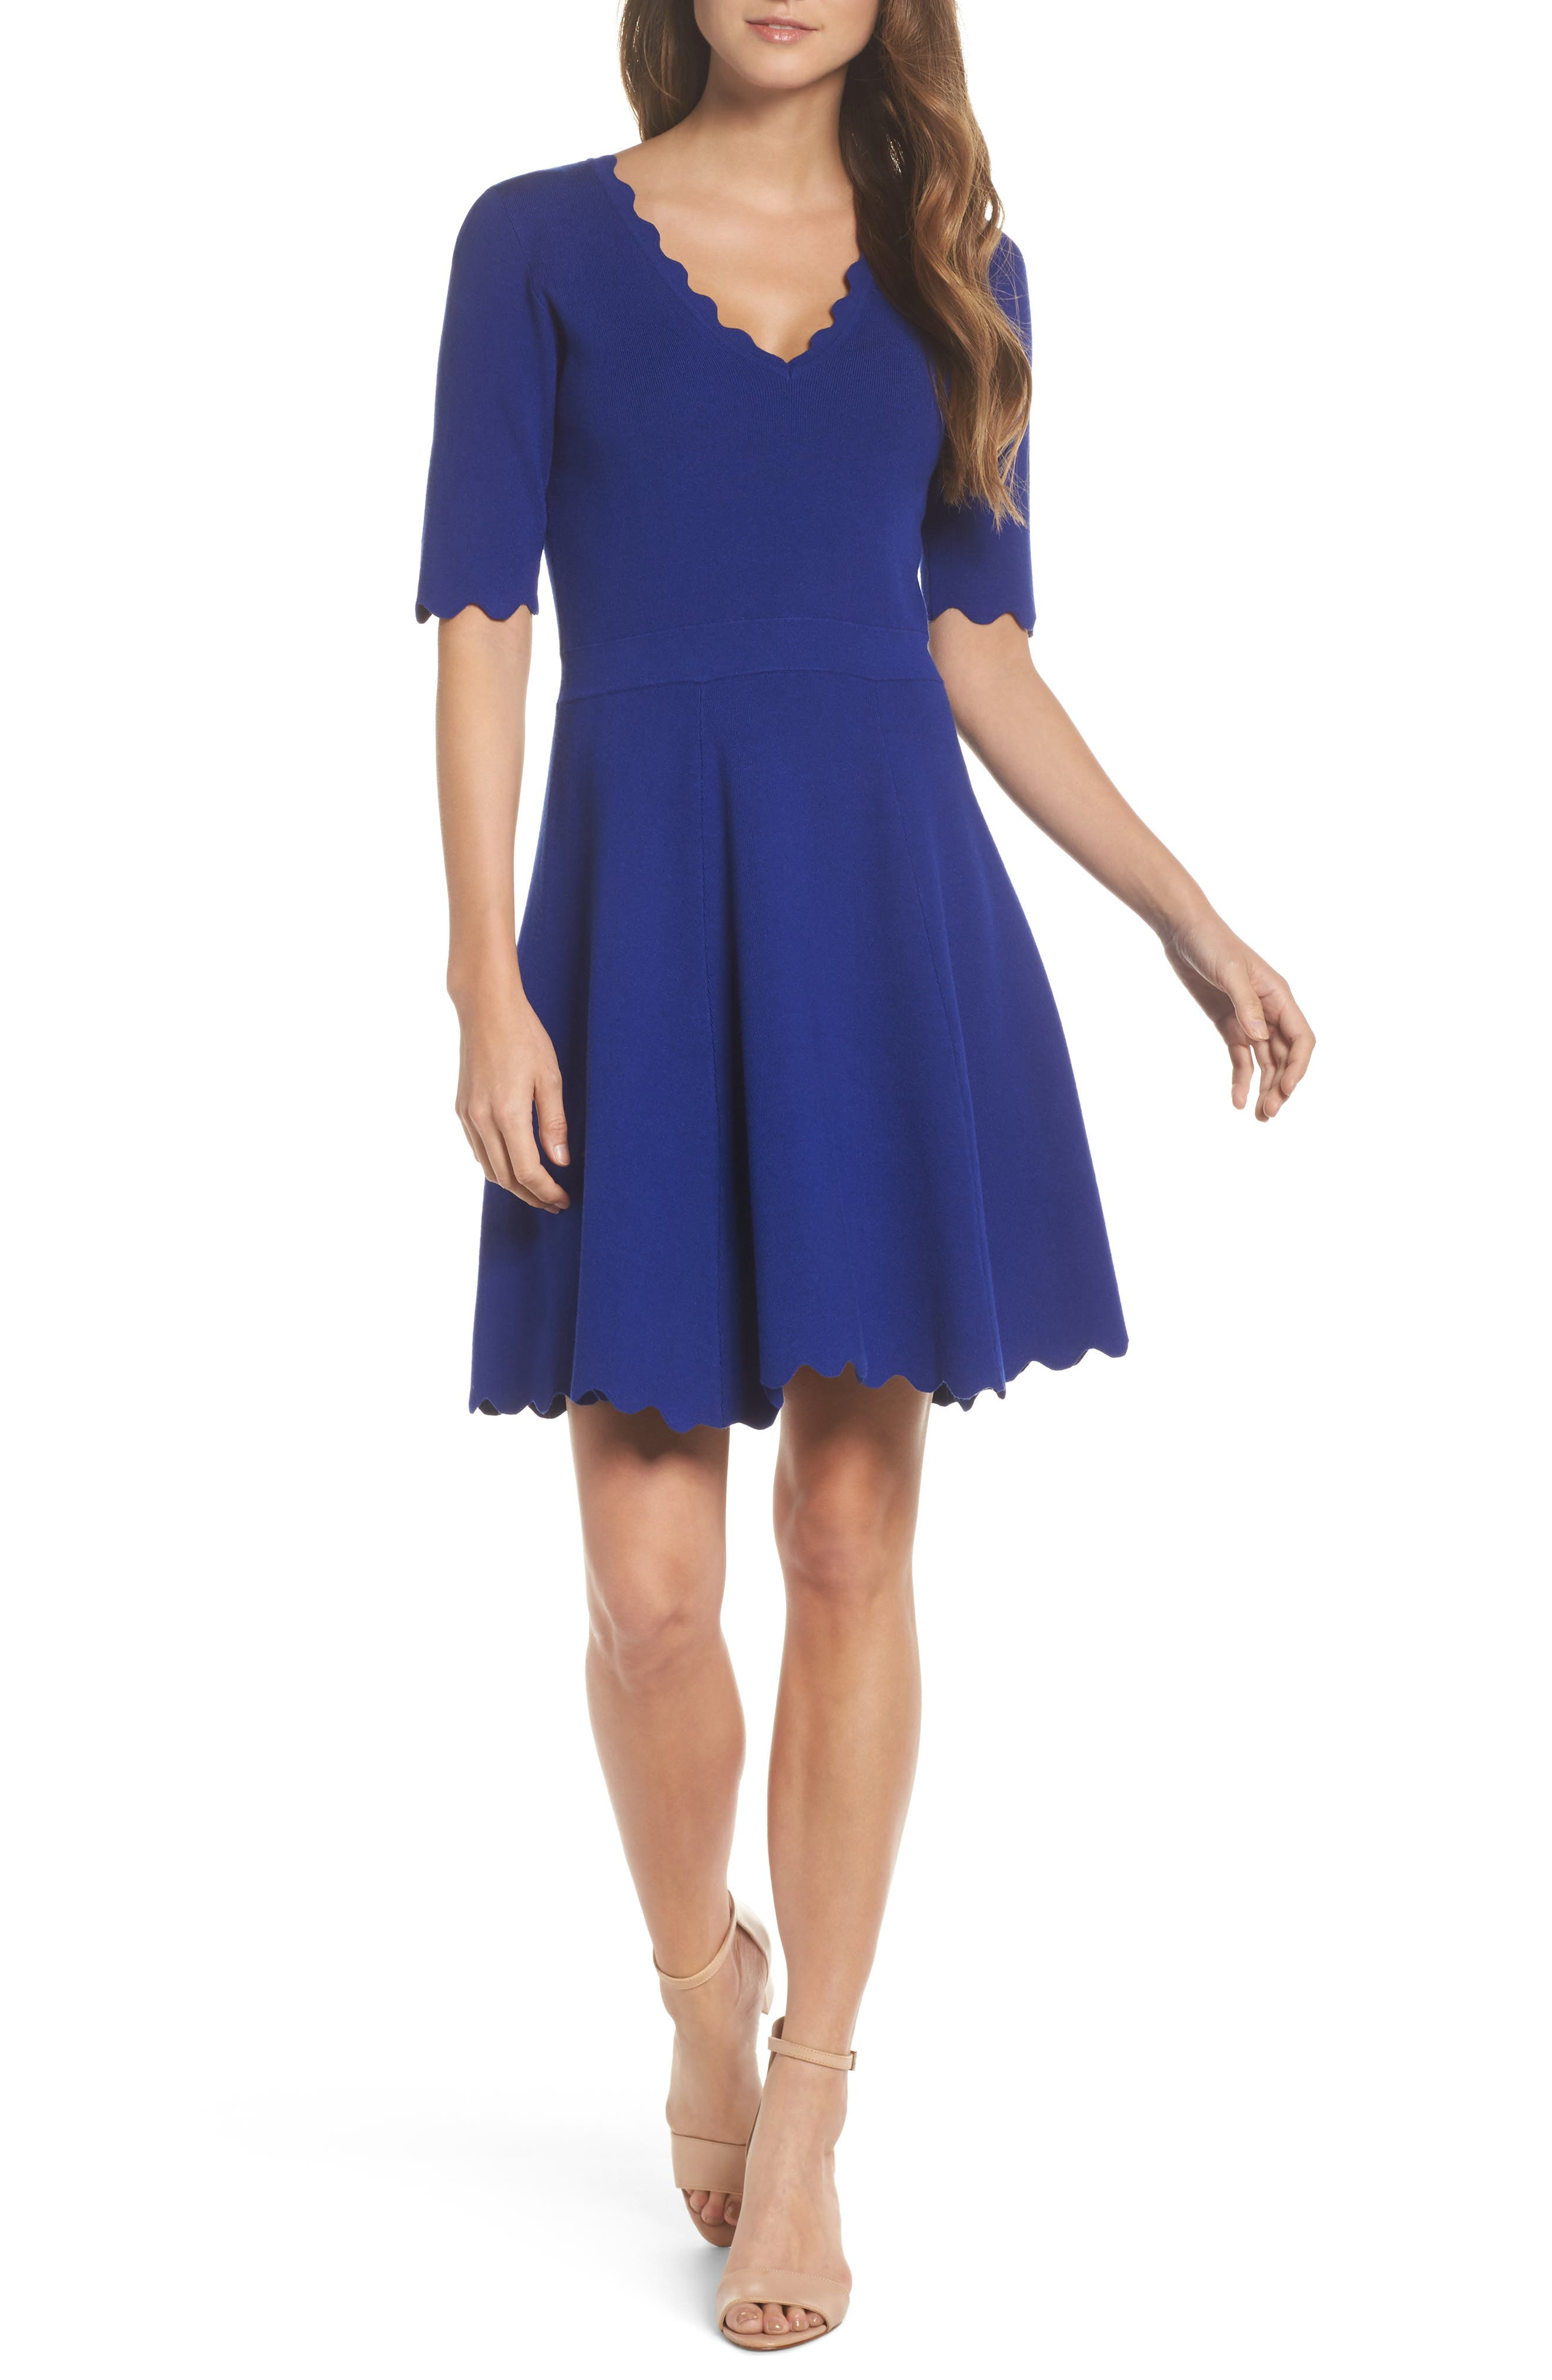 Alternate Image 1 Selected - Eliza J Scallop Fit & Flare Dress